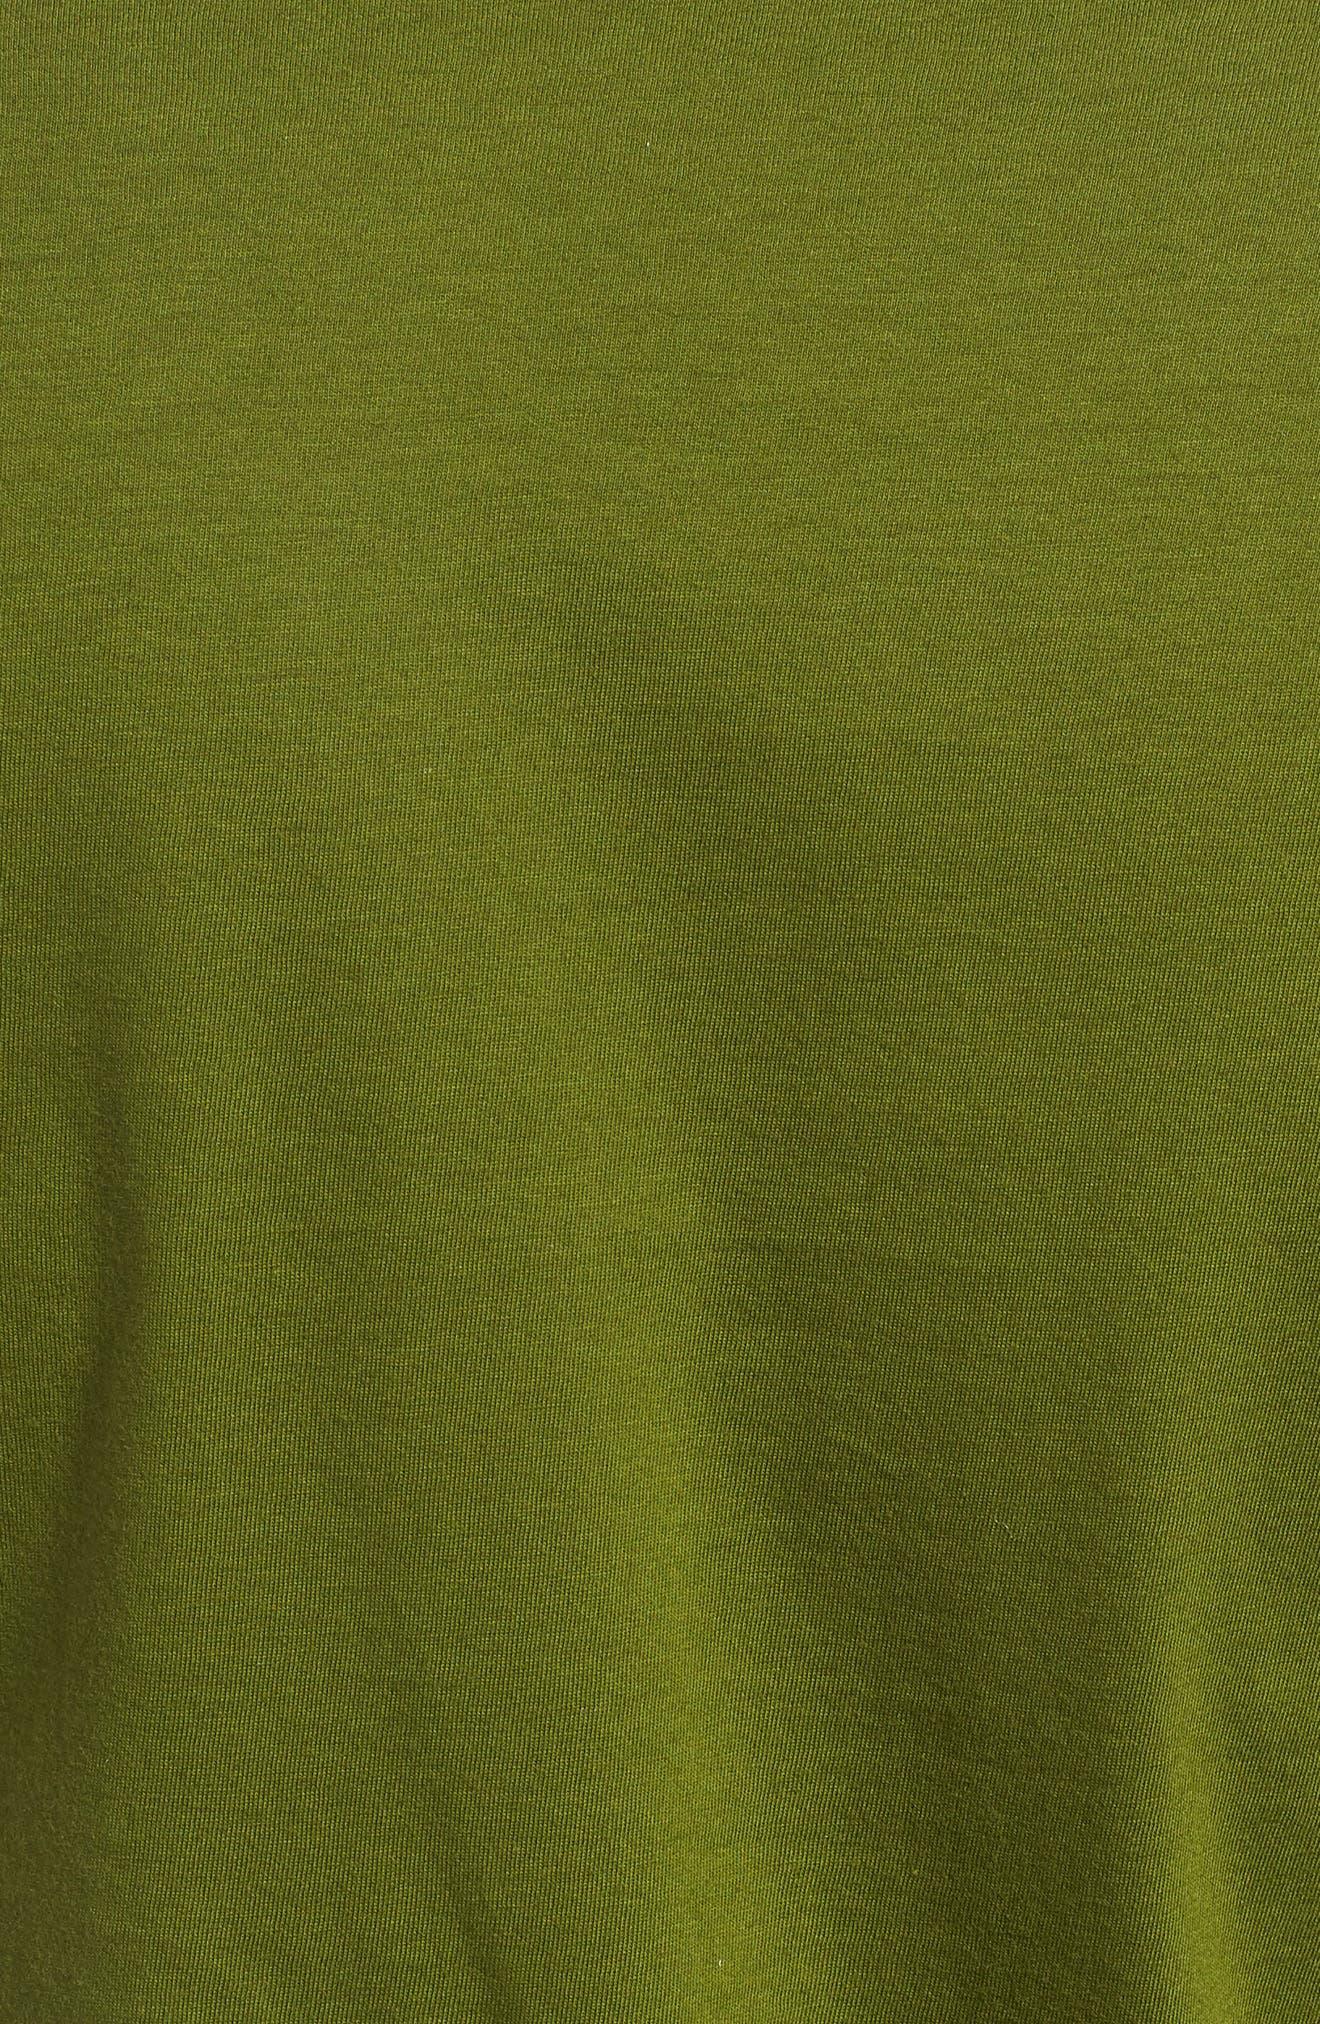 PATAGONIA,                             Oily Olas Slim Fit Organic Cotton T-Shirt,                             Alternate thumbnail 5, color,                             300